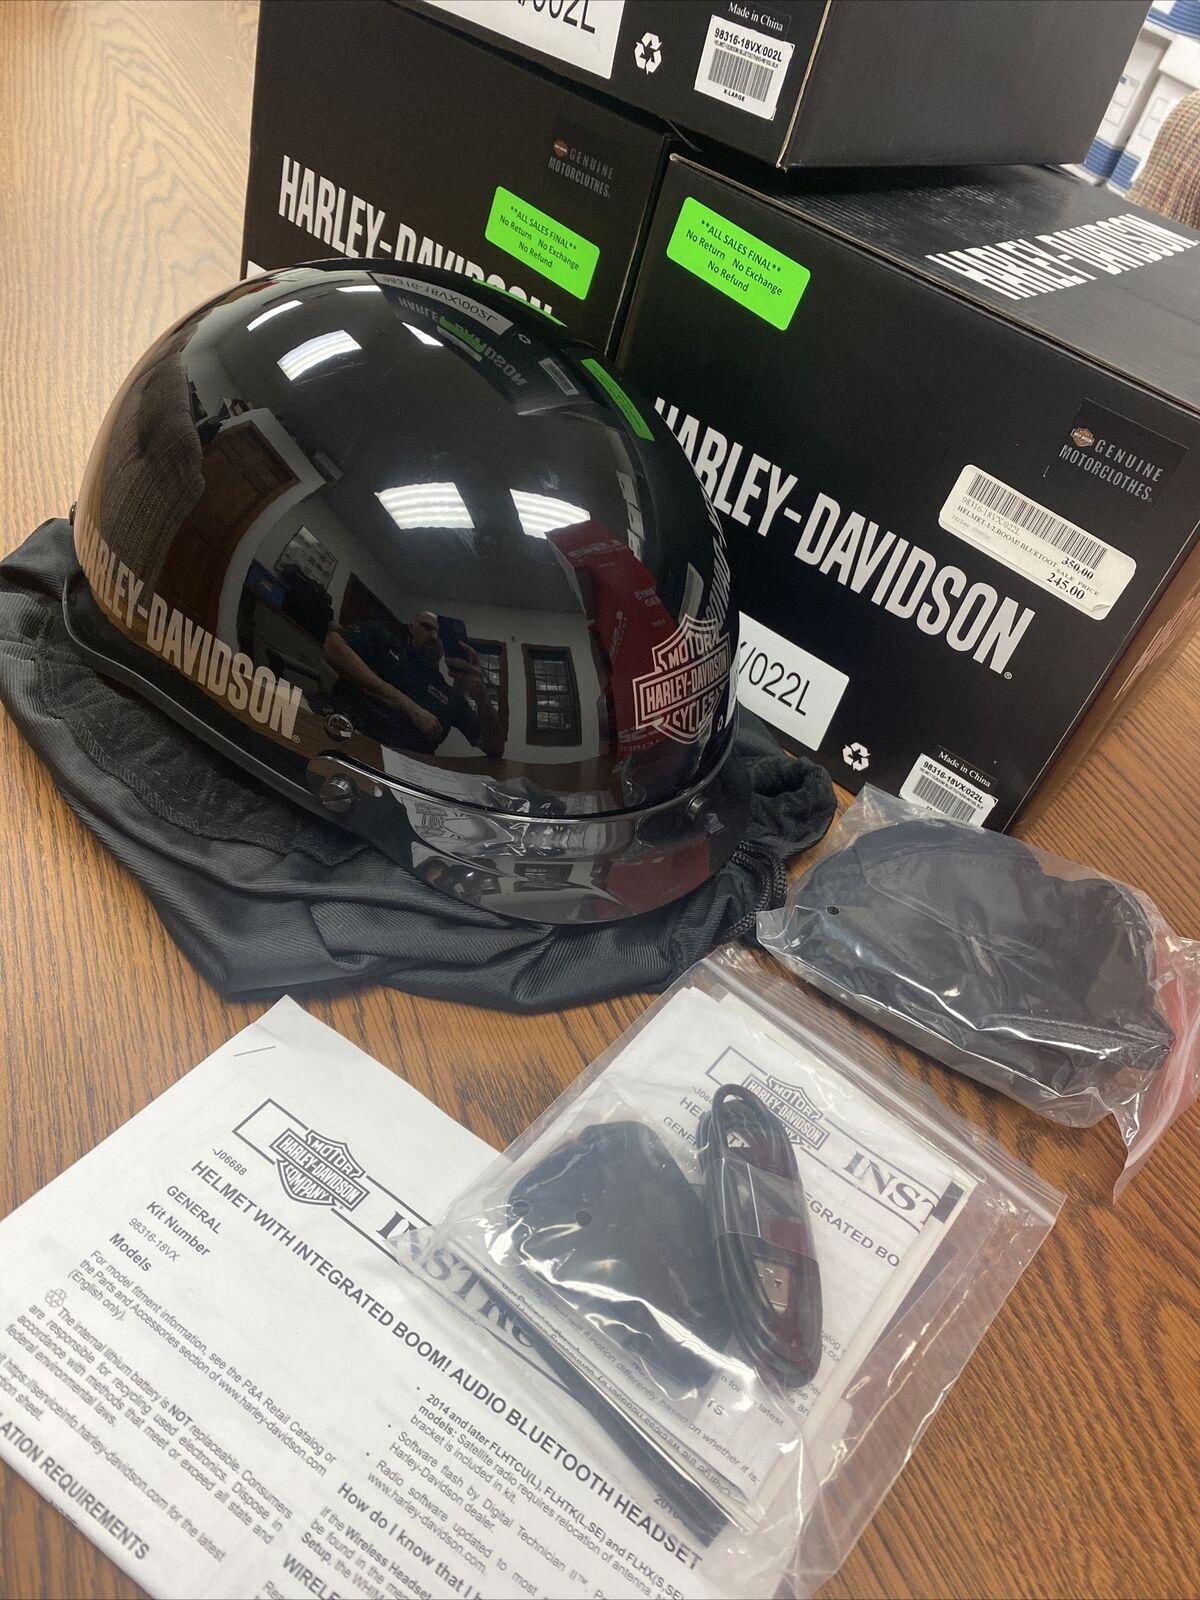 Harley Davidson Boom Audio No1 1 2 Helmet New With Box Bluetooth Sz Xl For Sale Online